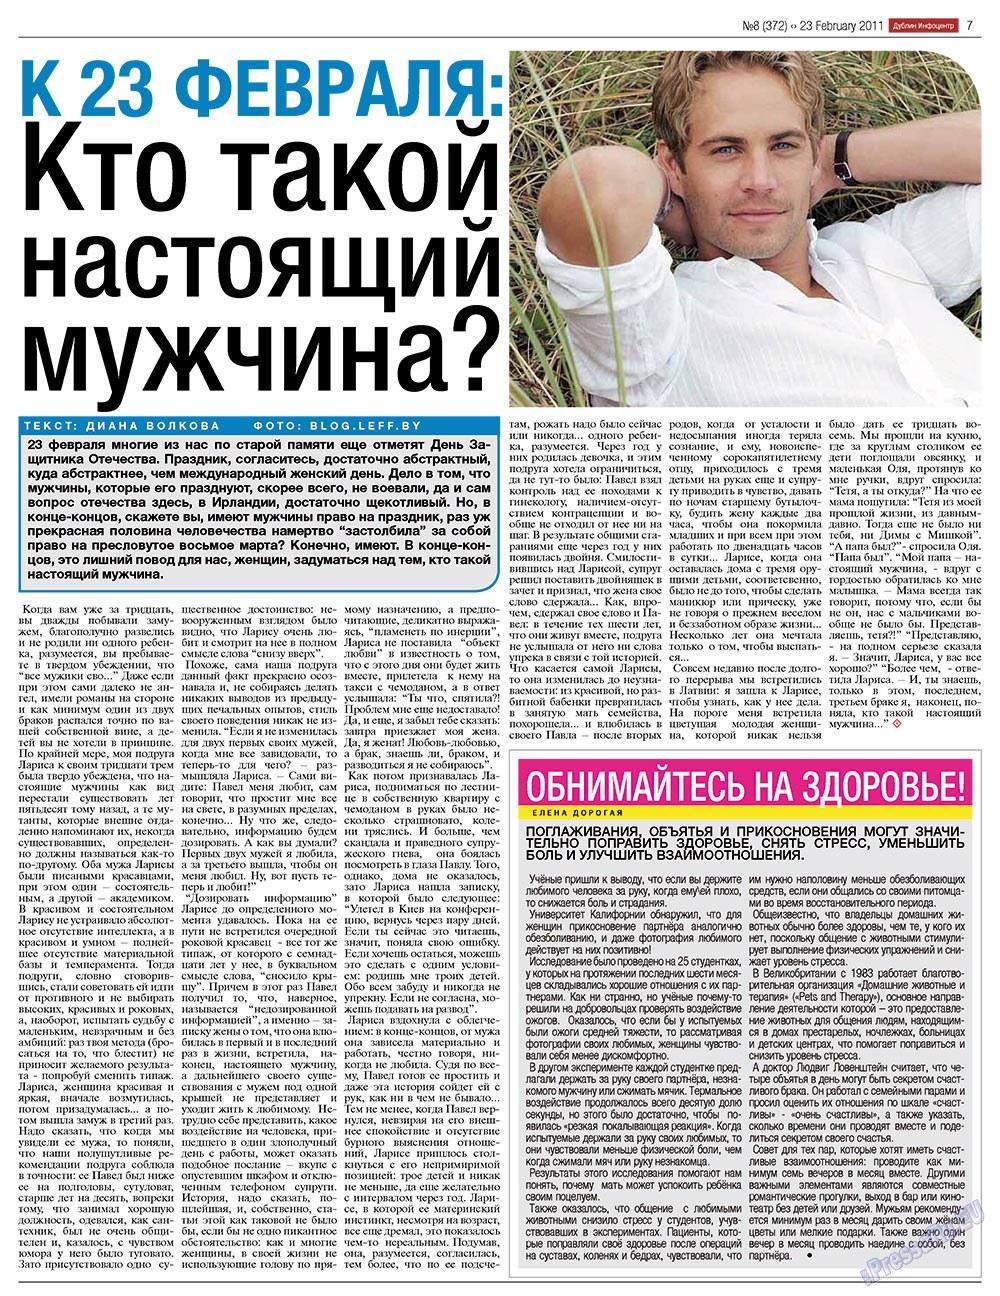 Дублин инфоцентр (газета). 2011 год, номер 8, стр. 7